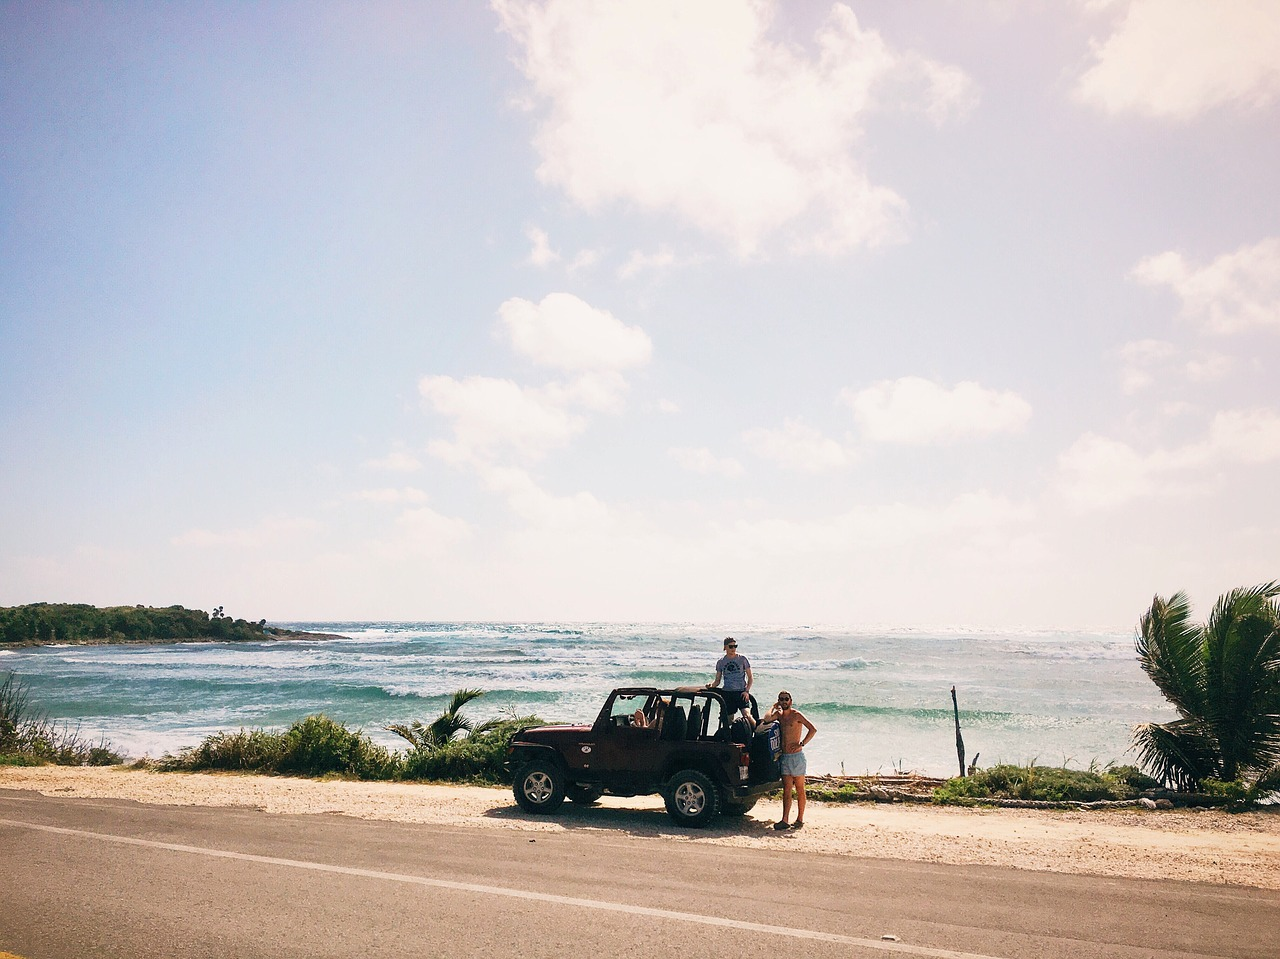 How to prepare for an adventure road trip   Travel blog   Elle Blonde Luxury Lifestyle Destination Blog